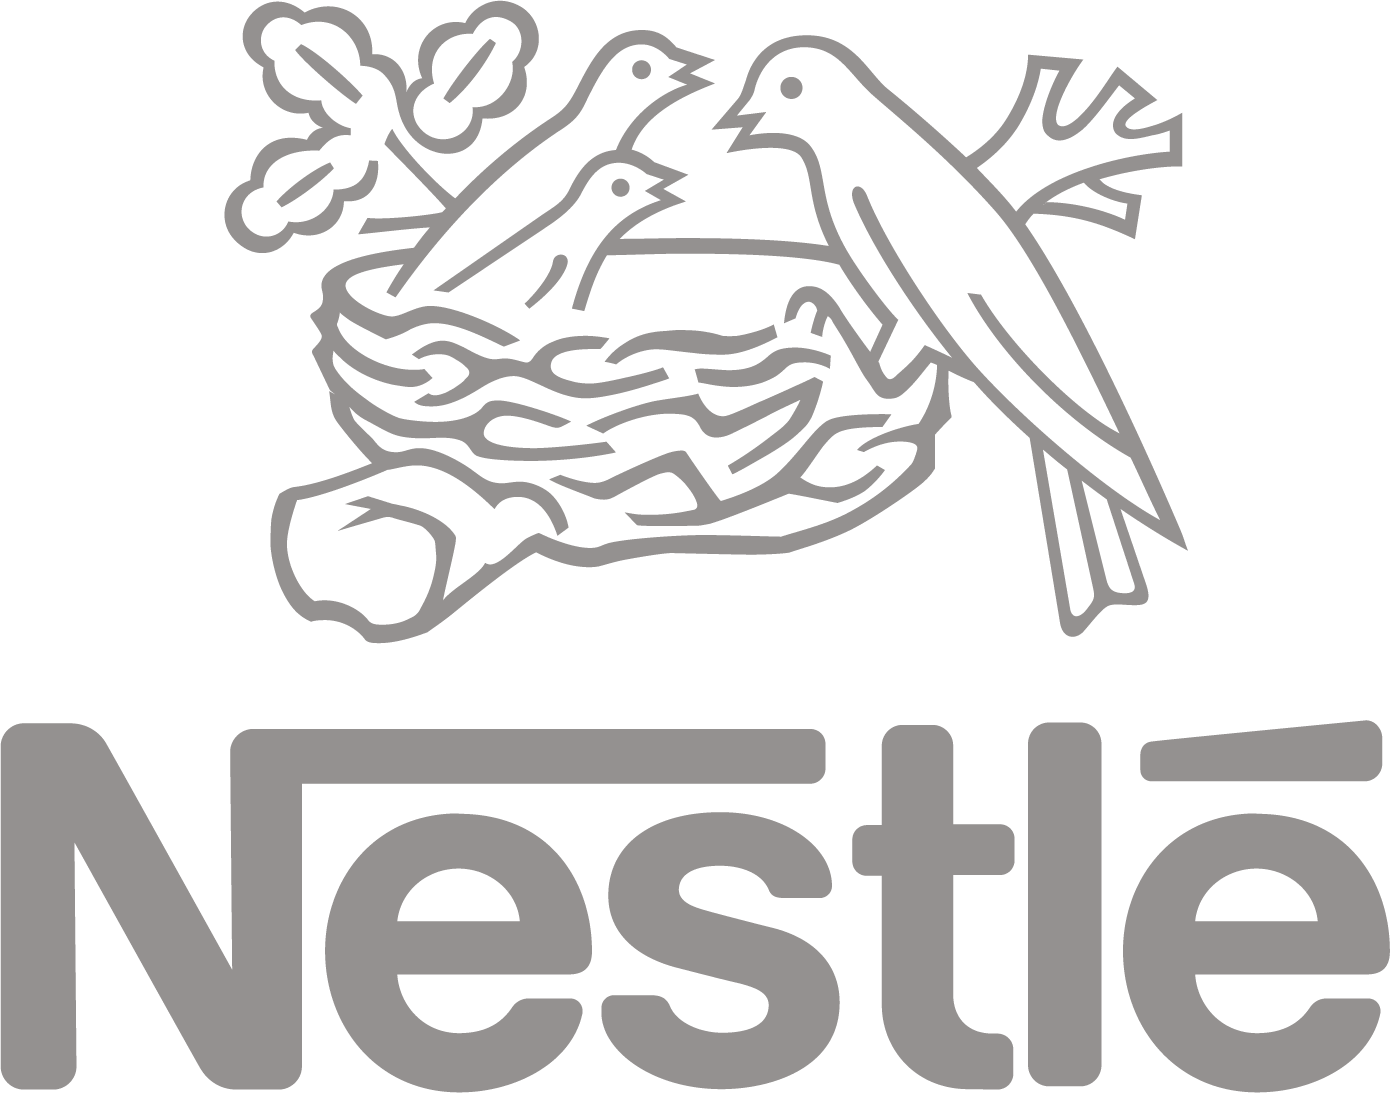 Logo Nestle Png Hdpng.com 1392 - Nestle, Transparent background PNG HD thumbnail